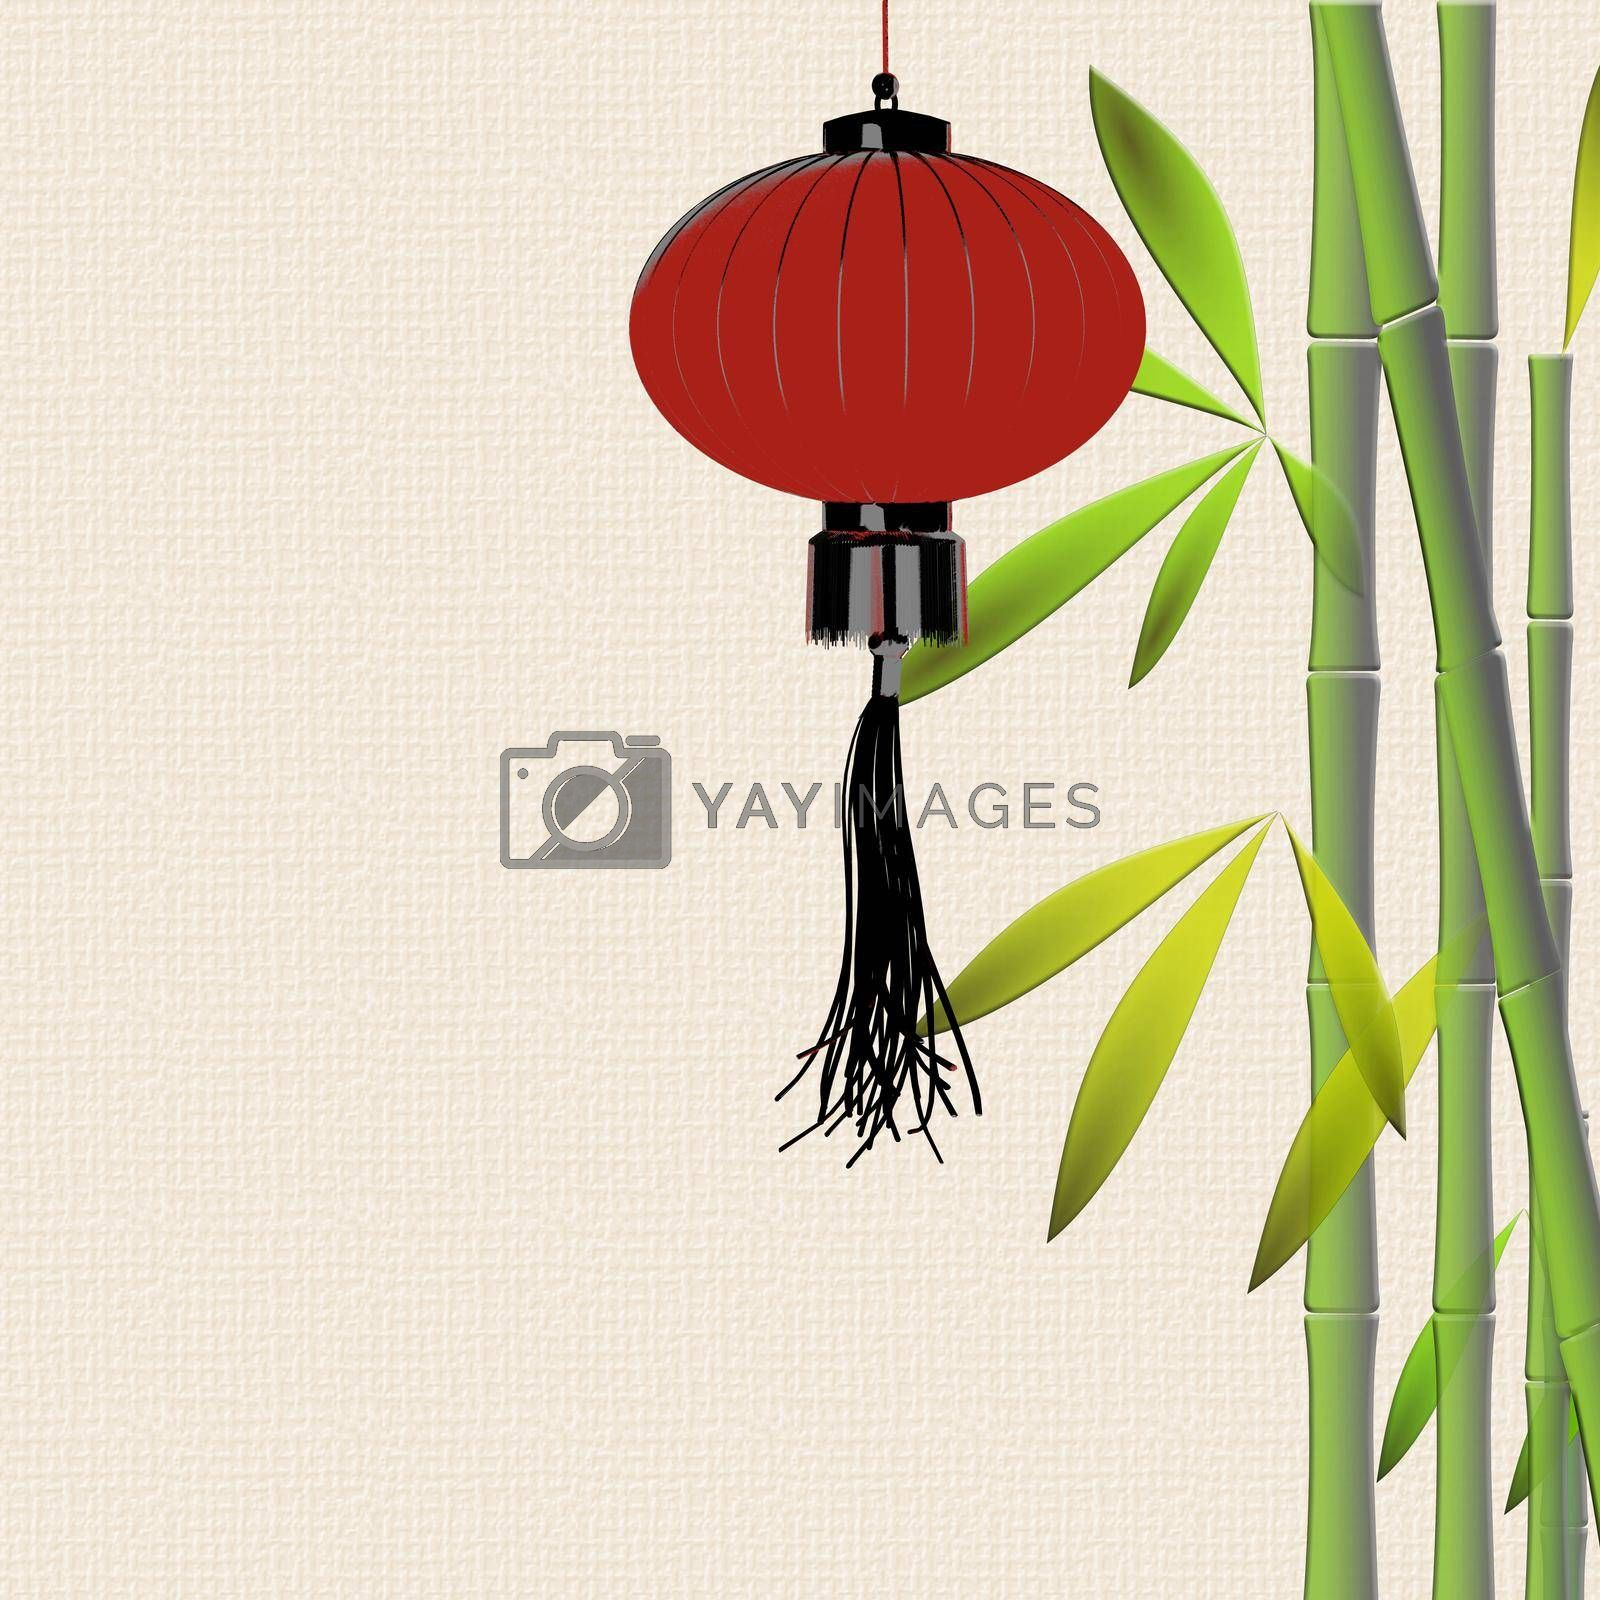 traditional Asian decor for Lantern festival by NelliPolk